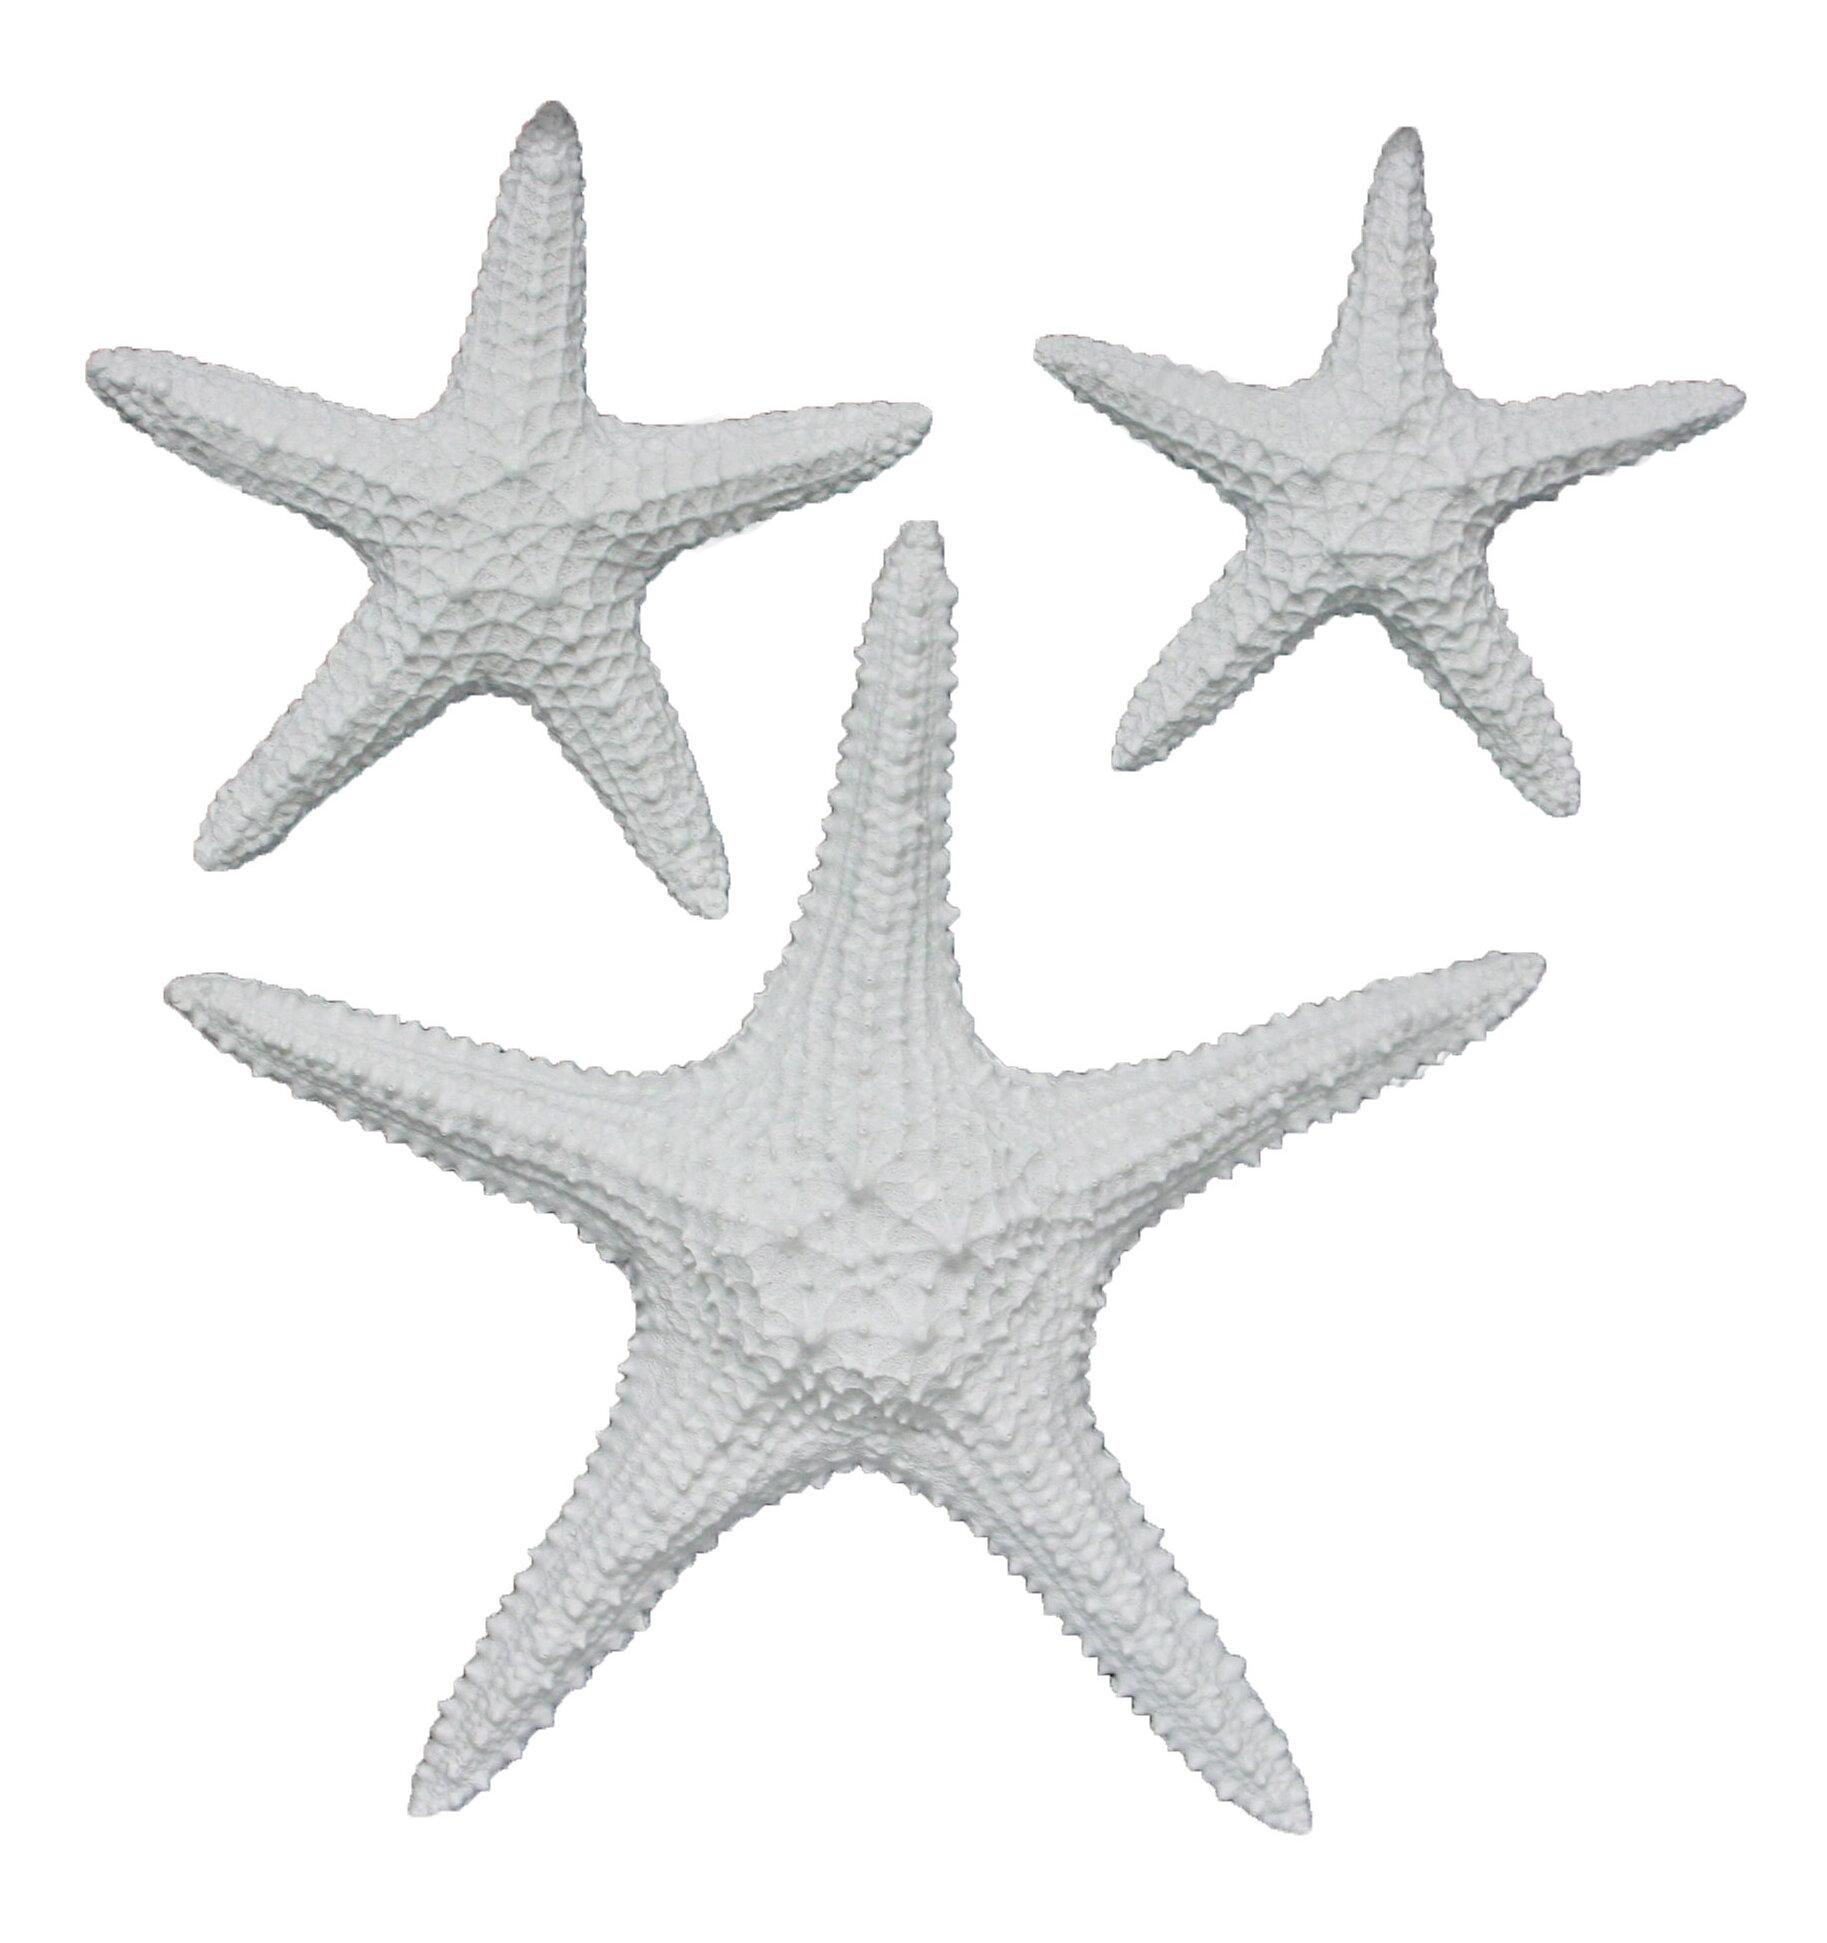 Fetco Home Decor Yelton 3 Piece Starfish Wall Décor Set U0026 Reviews | Wayfair